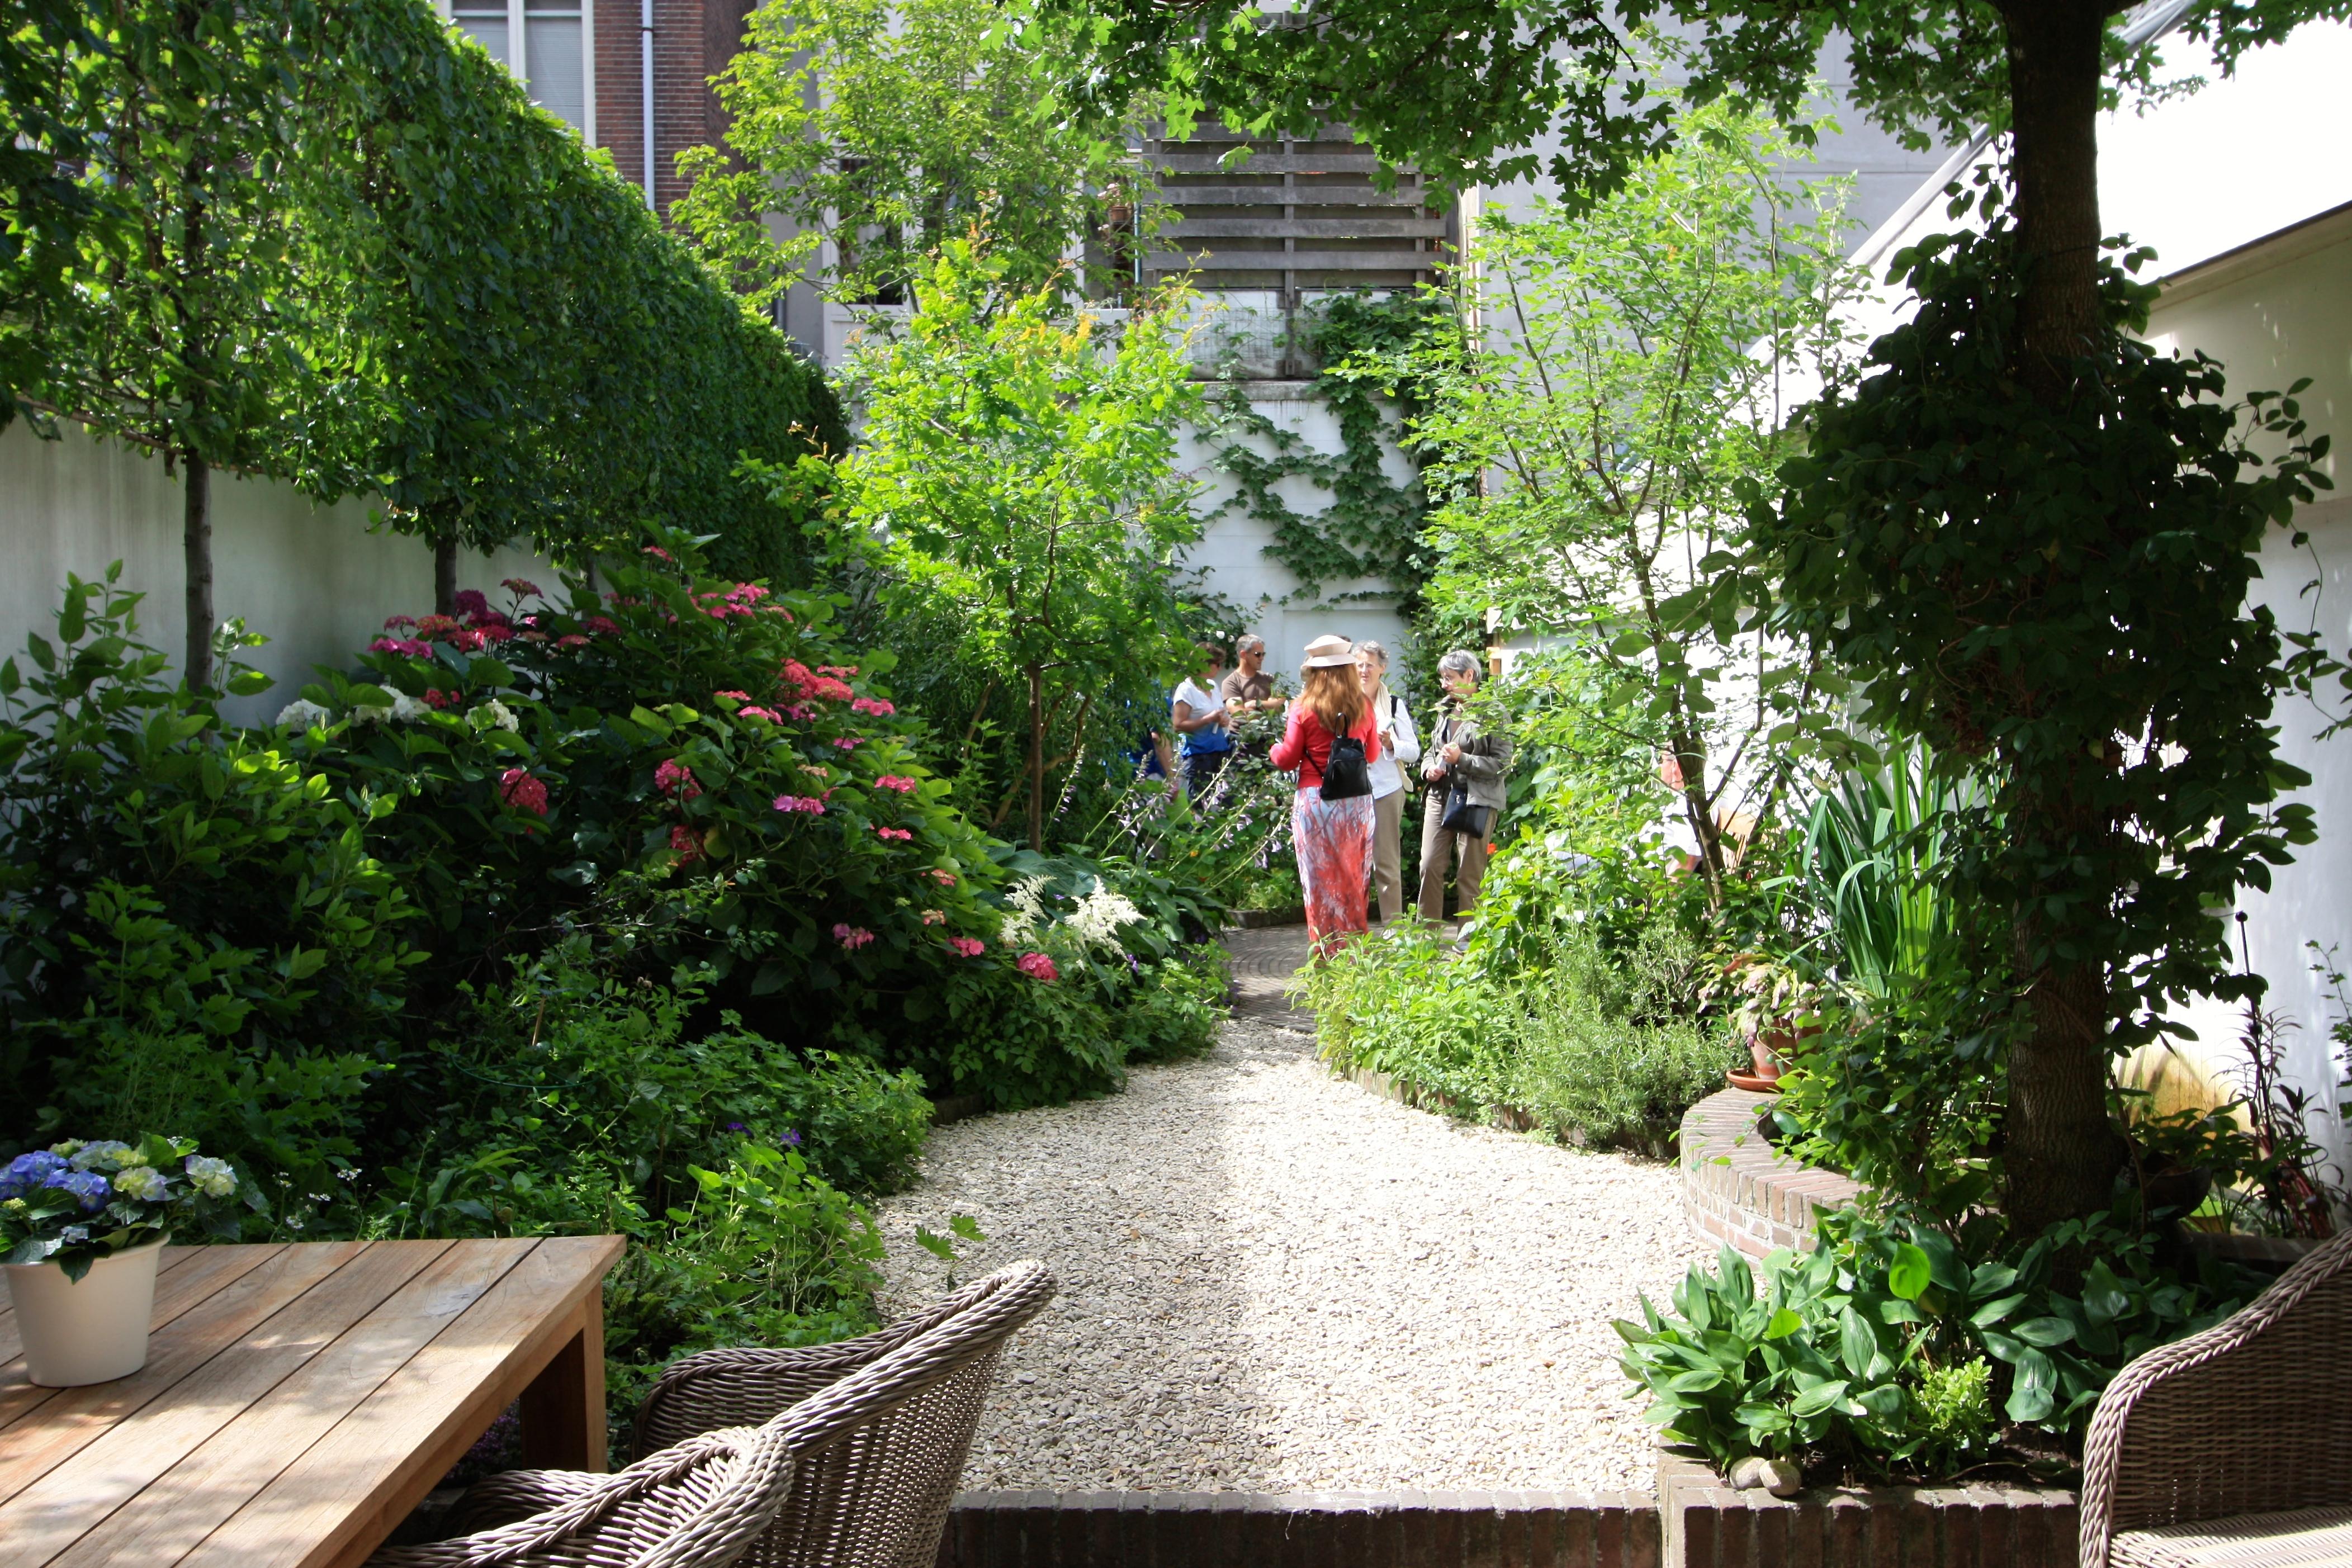 Travel the frustrated gardener for Narrow garden designs